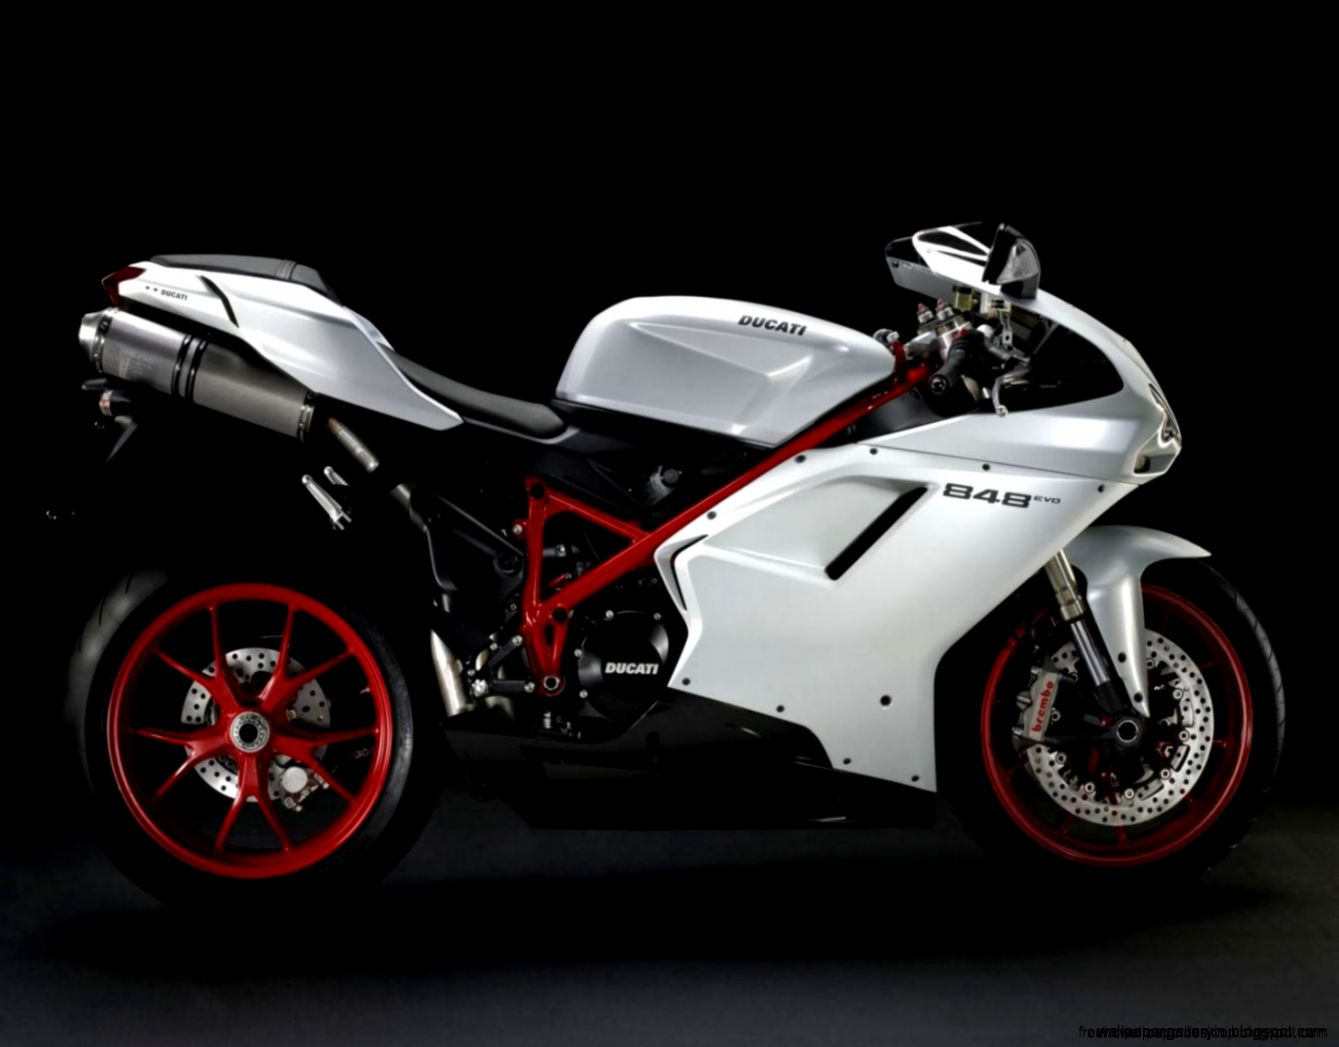 Superbike Ducati 848 Evo Side Cool Wallpaper Desktop  Free High